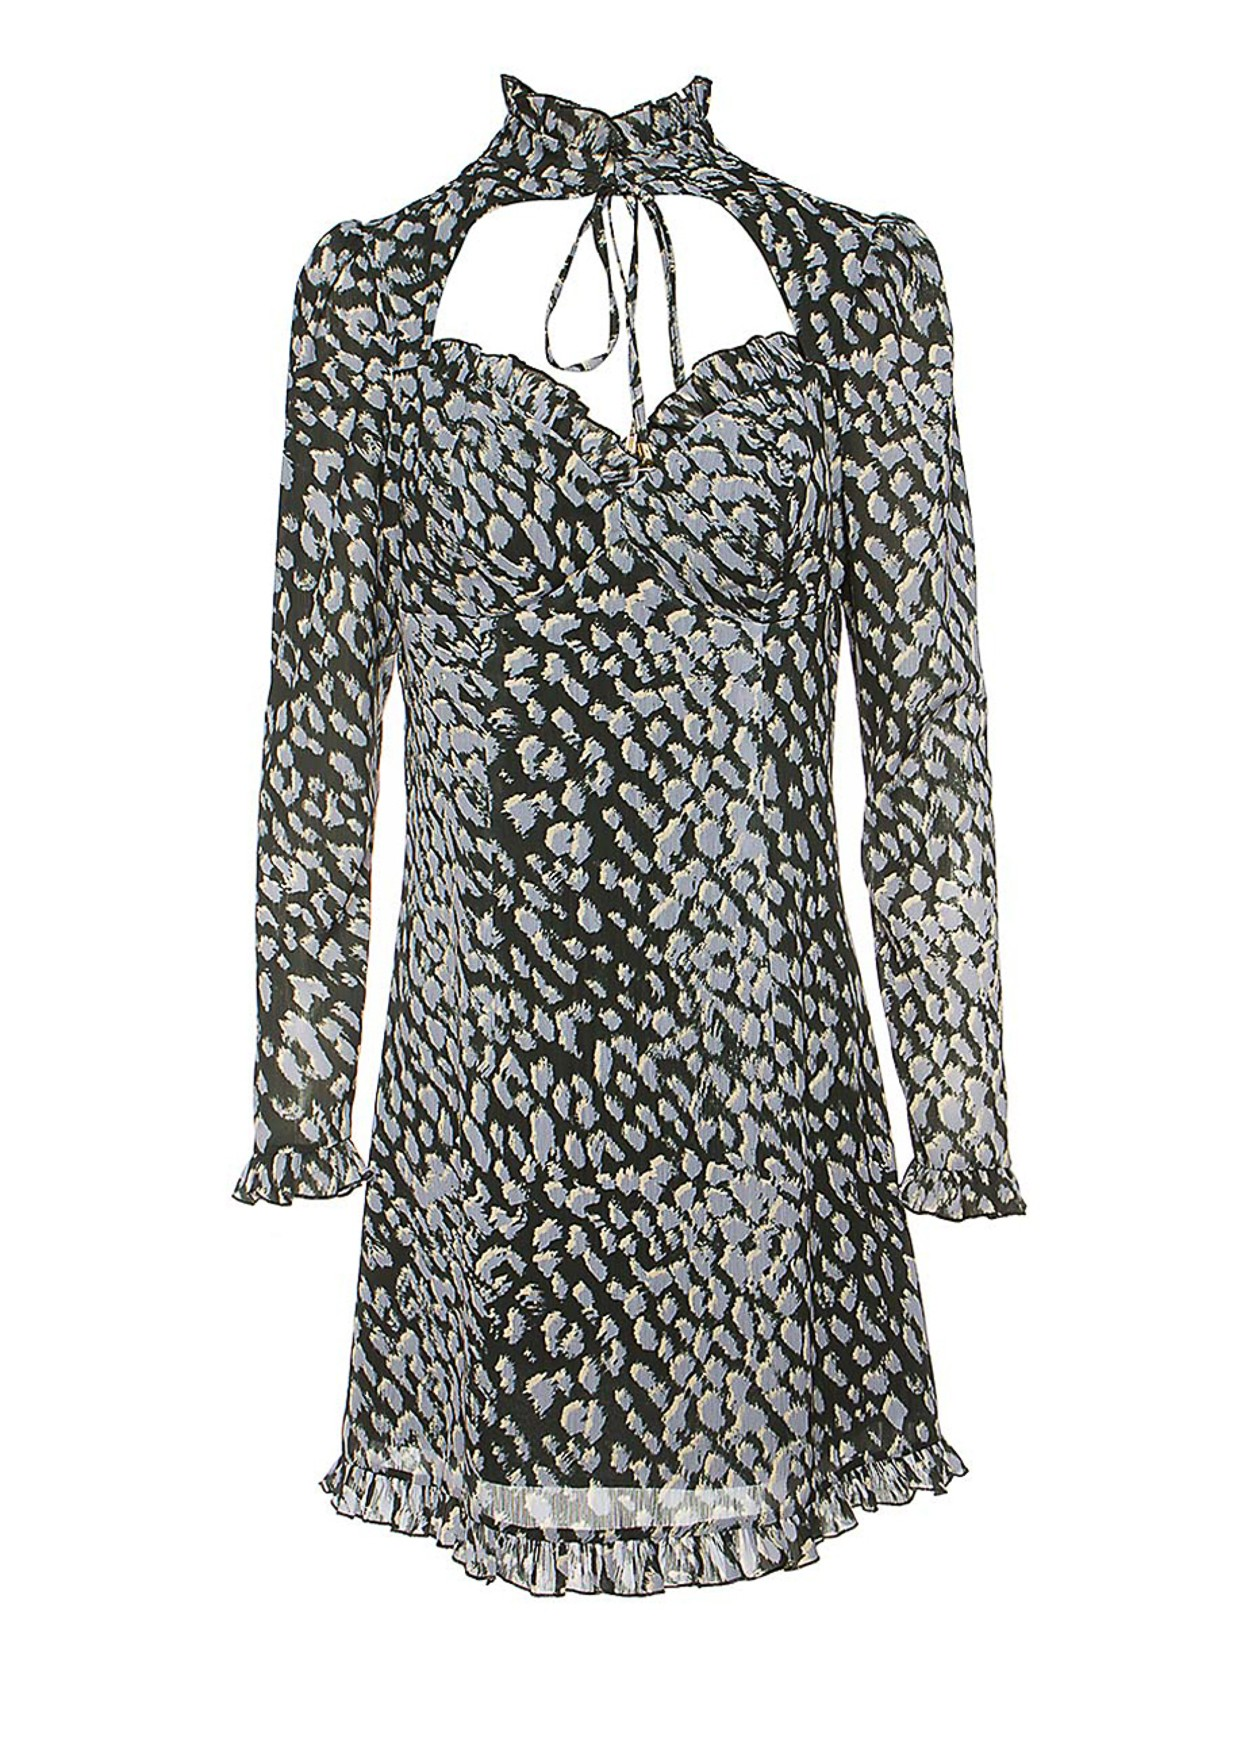 Mini dress with sweetheart neckline